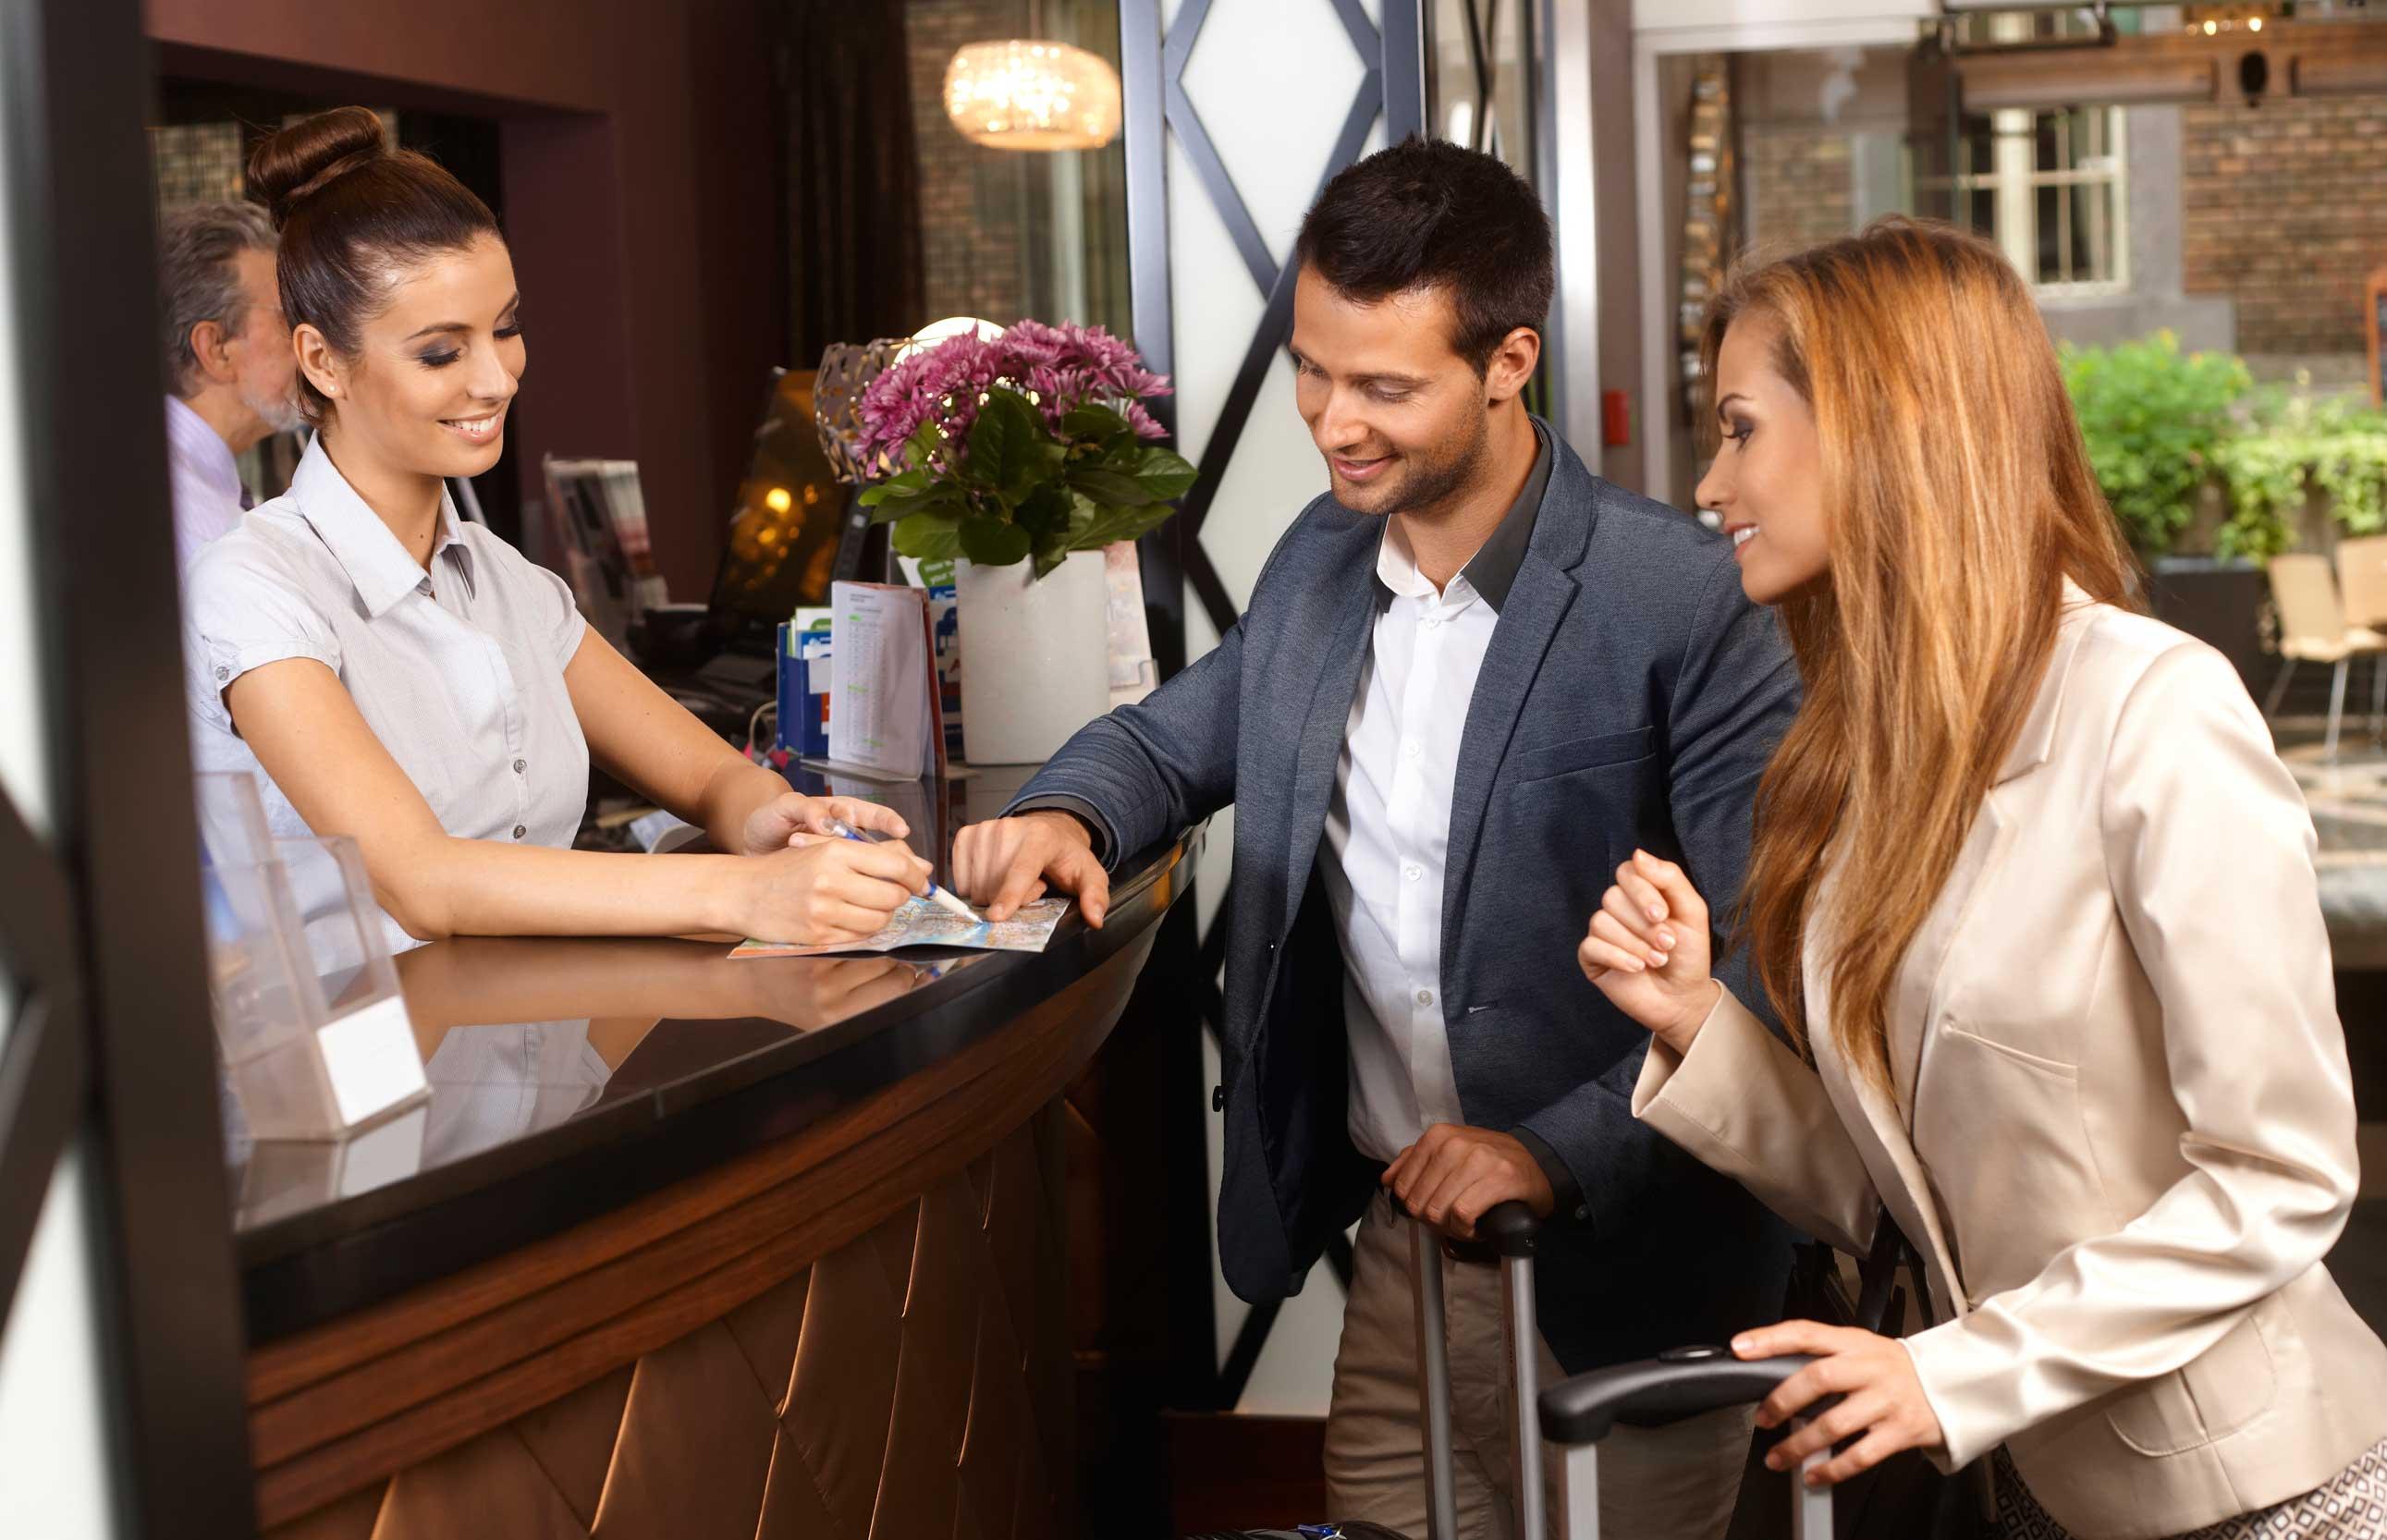 Marriott-and-Starwood-rewards